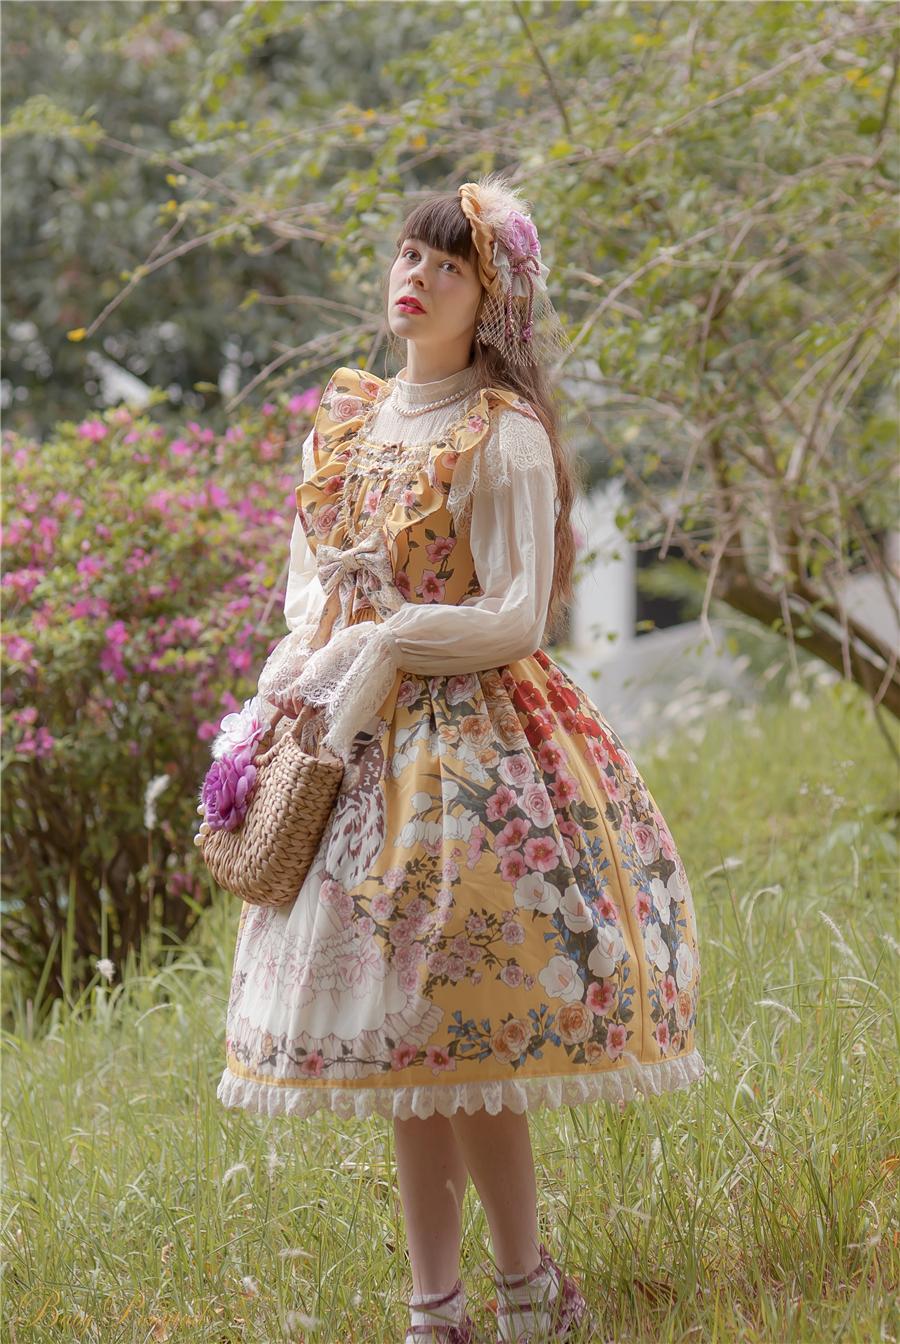 Baby Ponytail_Model Photo_Polly's Garden of Dreams_JSK Yellow_Claudia_3.jpg